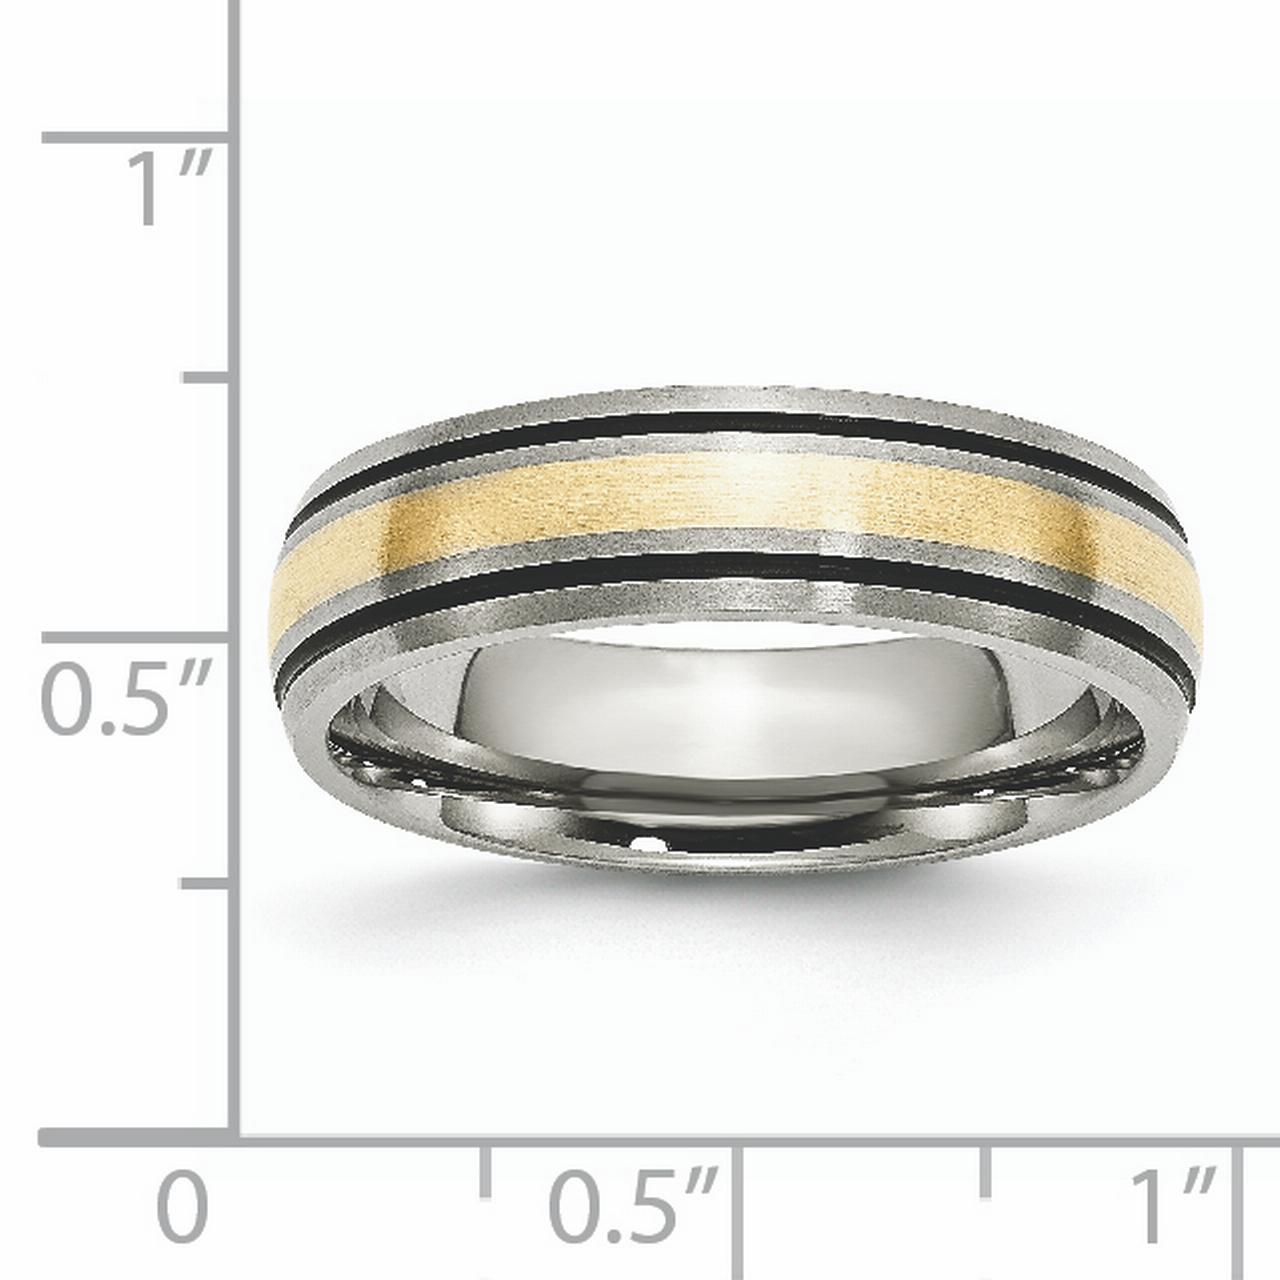 Titanium 14k Gold Inlay 6mm Brushed Band Best Quality Free Gift Box